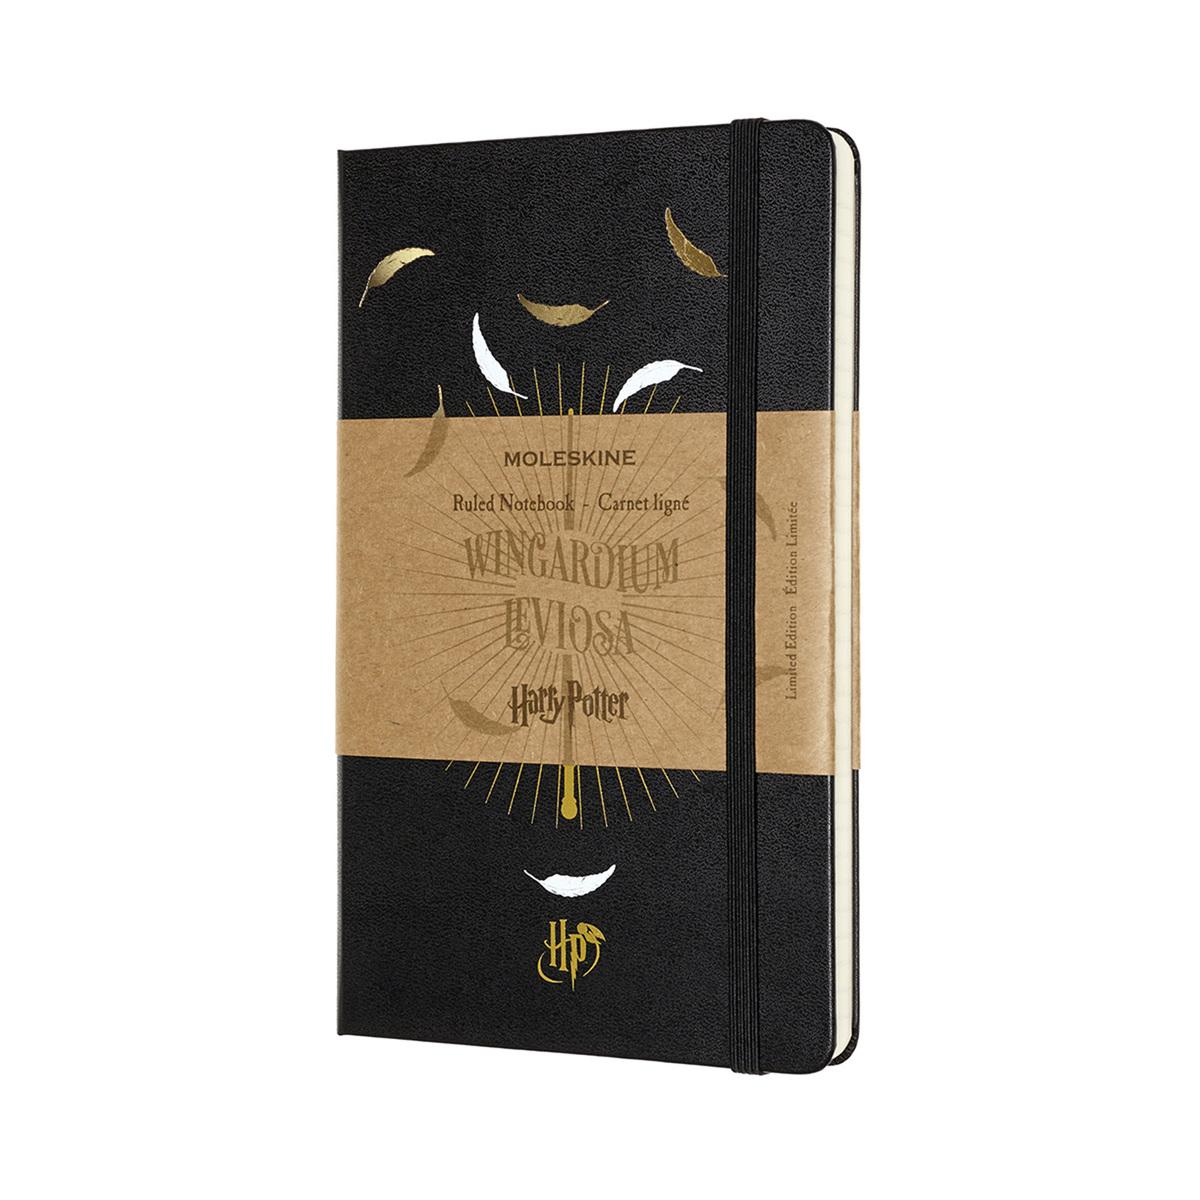 Harry Potter Limited Edition Notebook - Wingardium Leviosa, Large, Ruled, Hard Cover